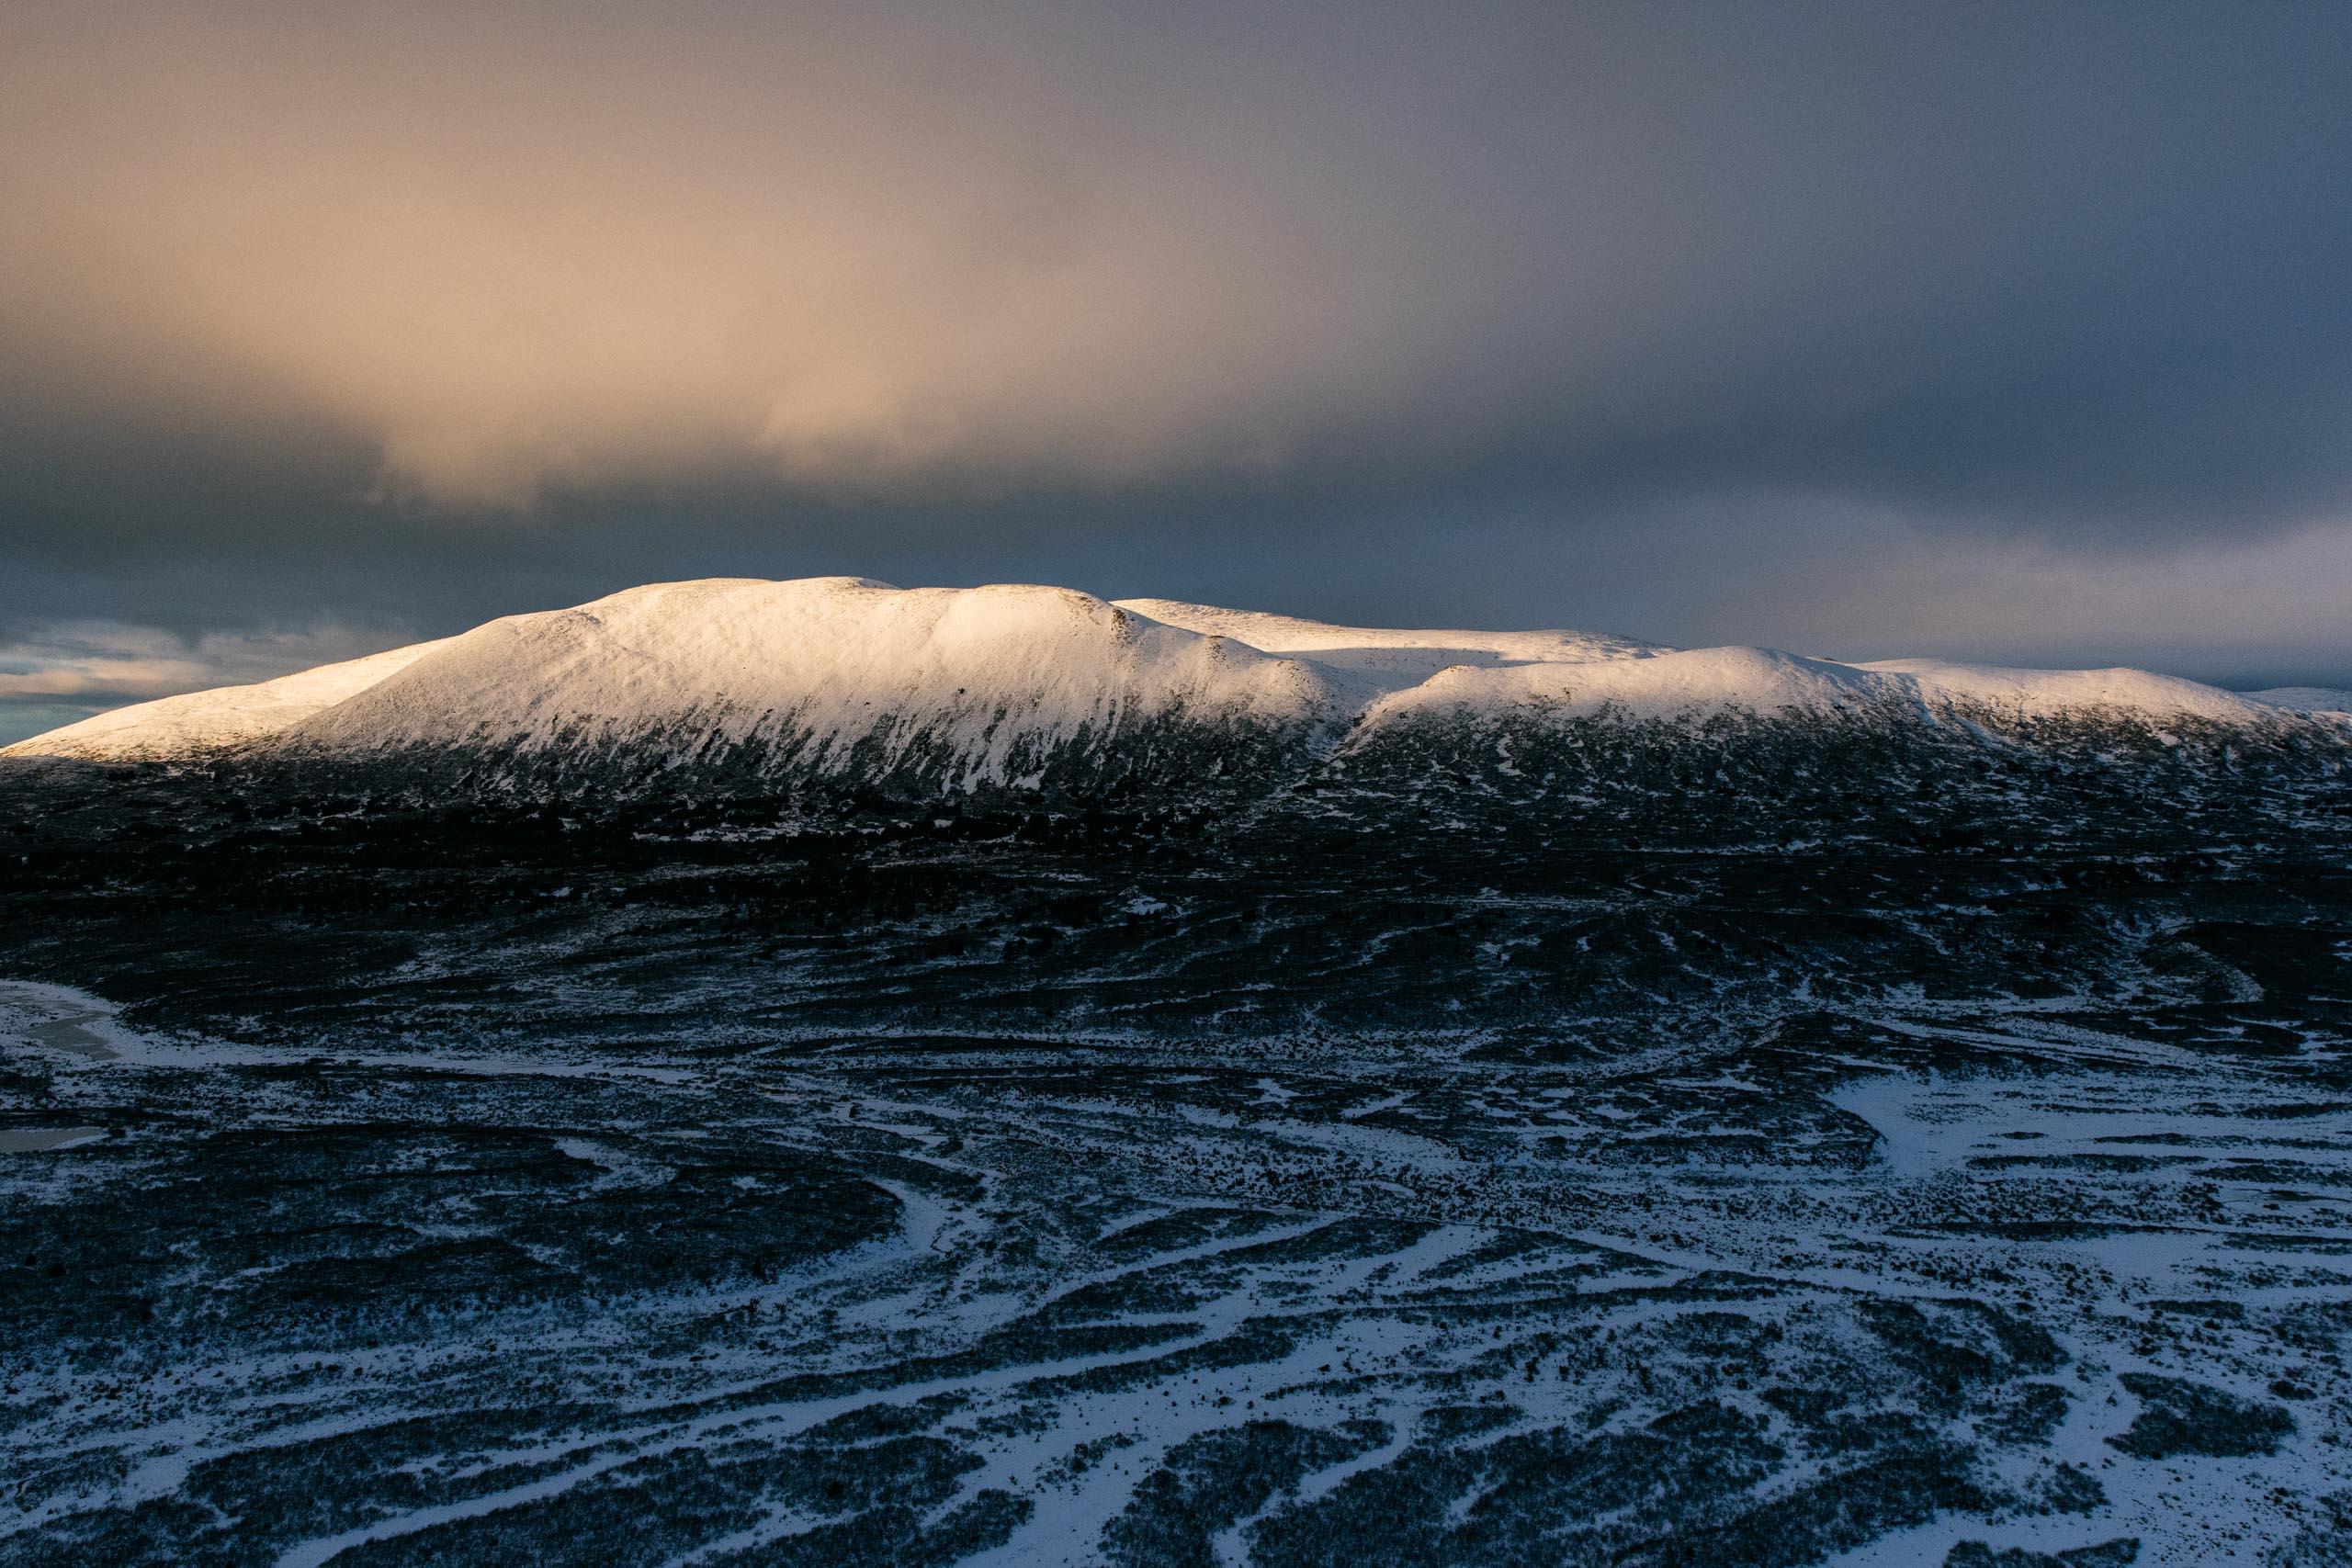 Cassiar Ranges Tahltan territory Jeremy Koreski The Narwhal